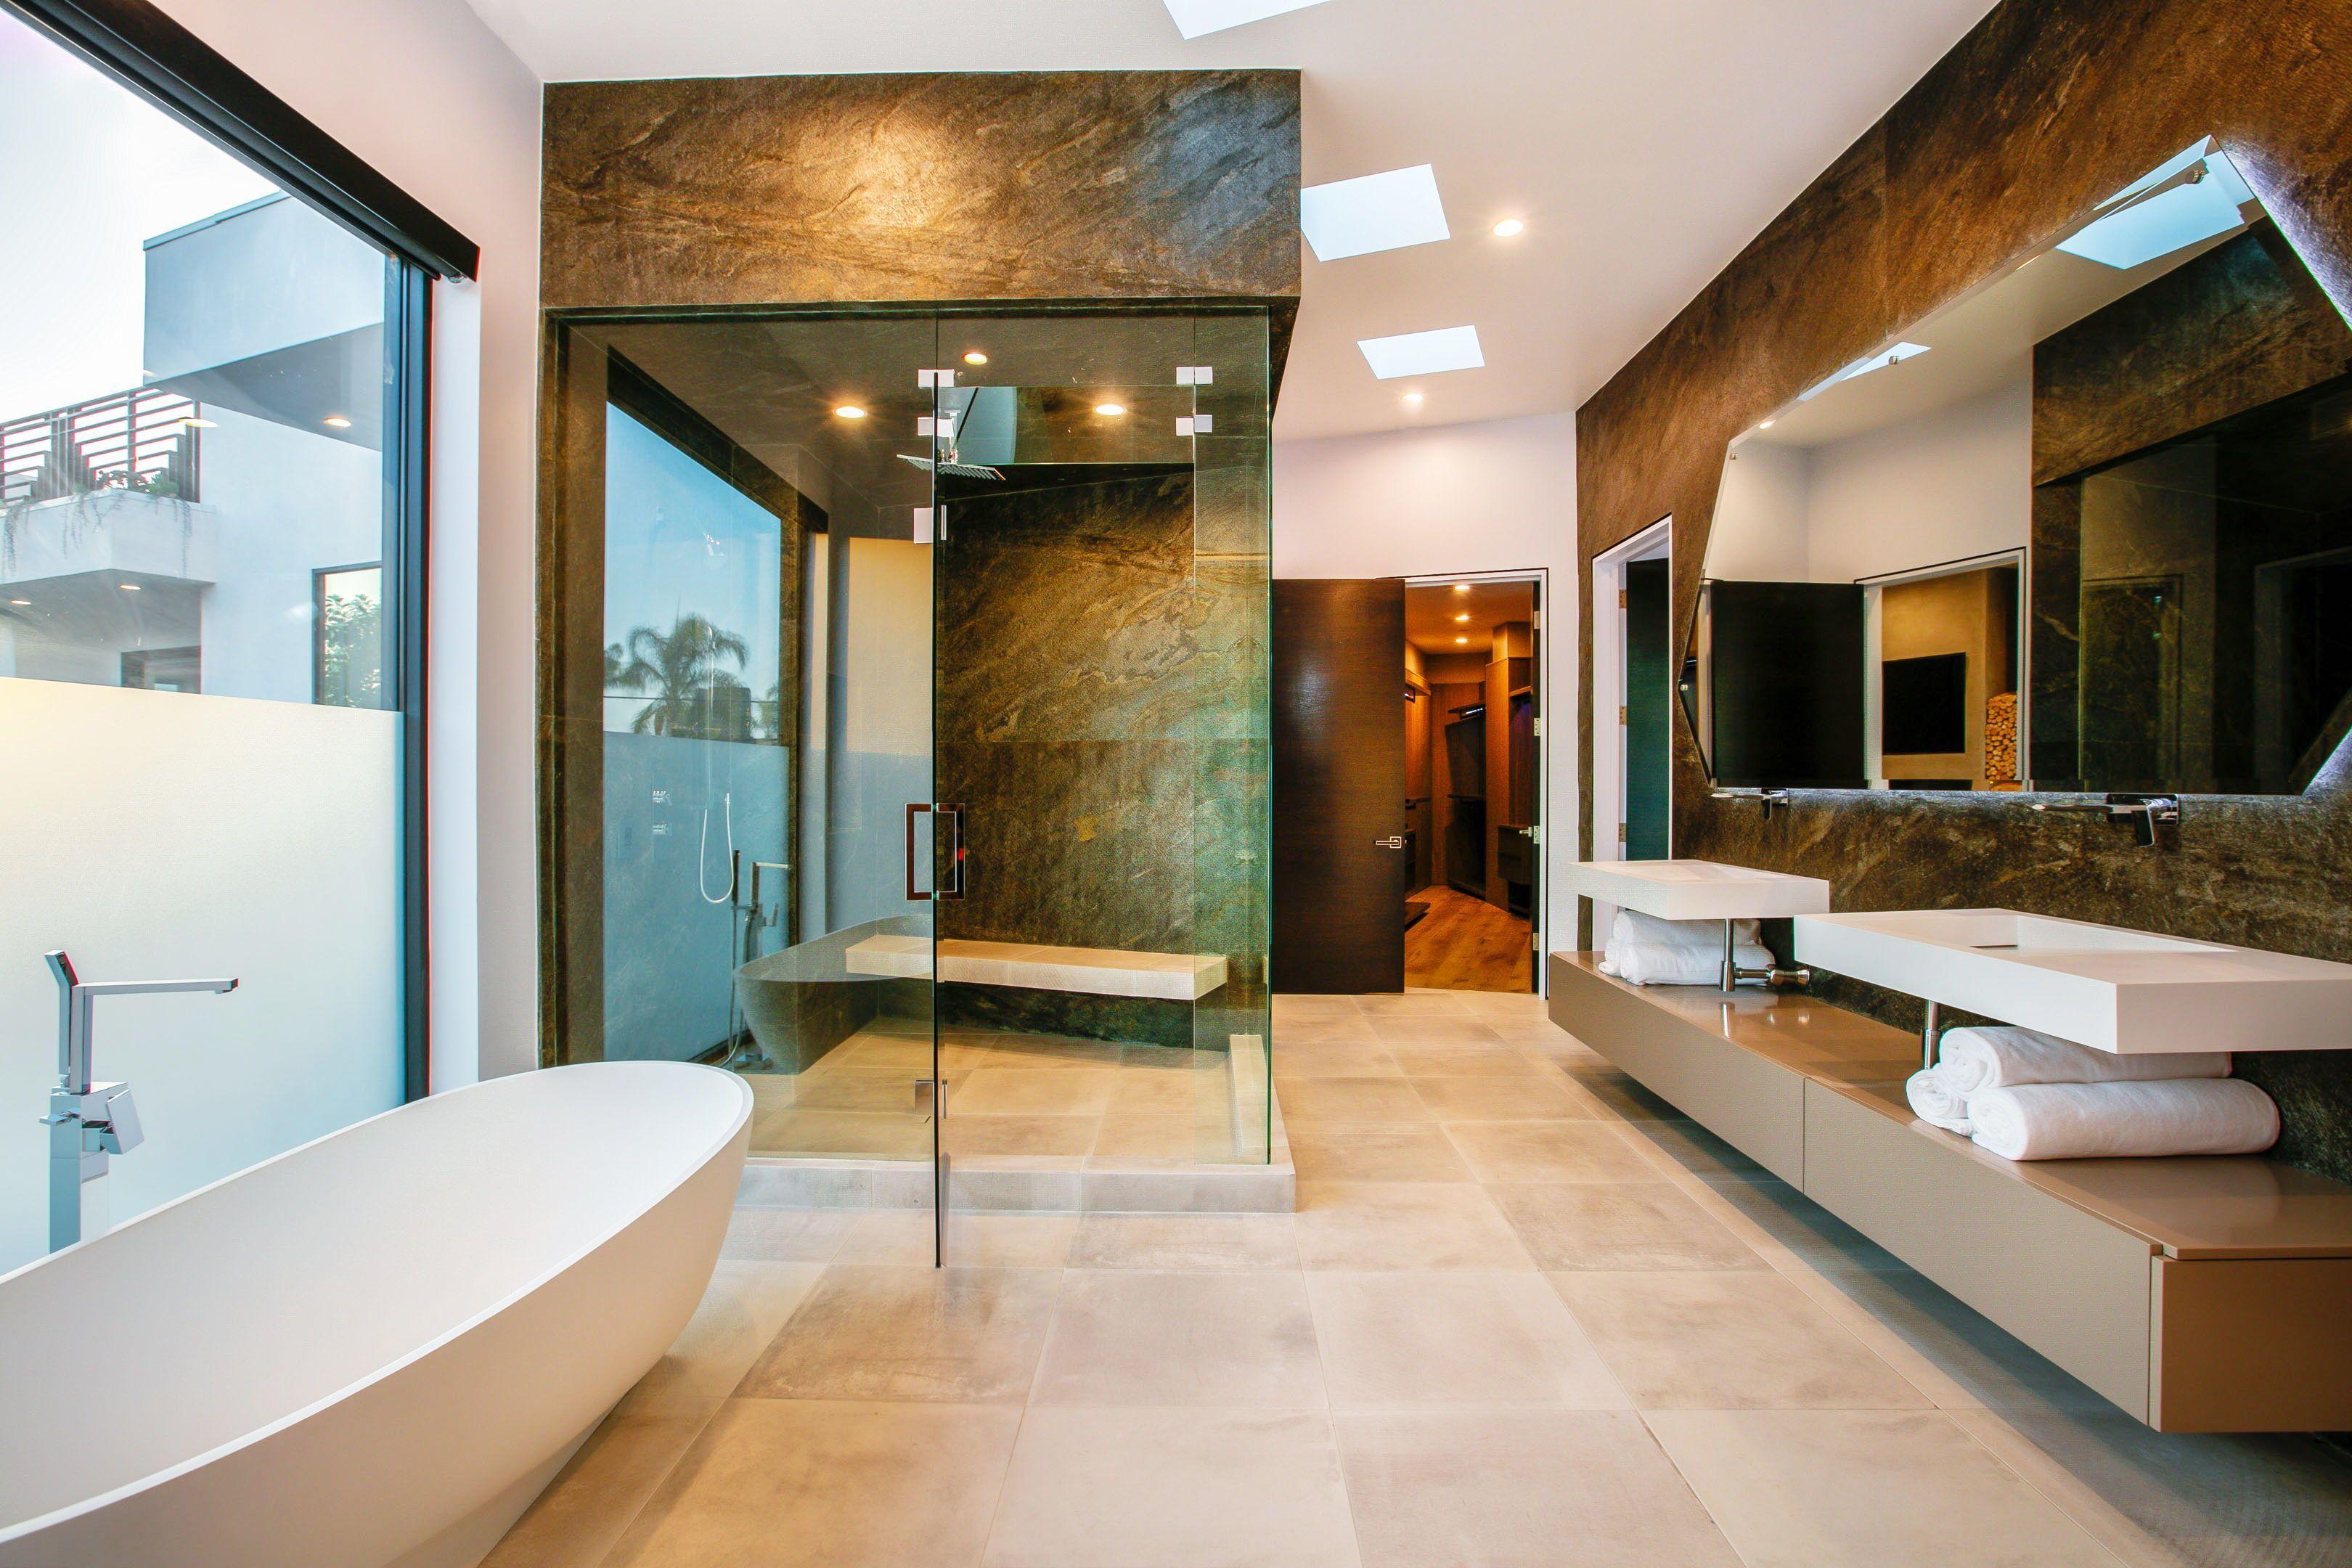 Custom Designed Master Bathroom Featuring Walk In Shower And